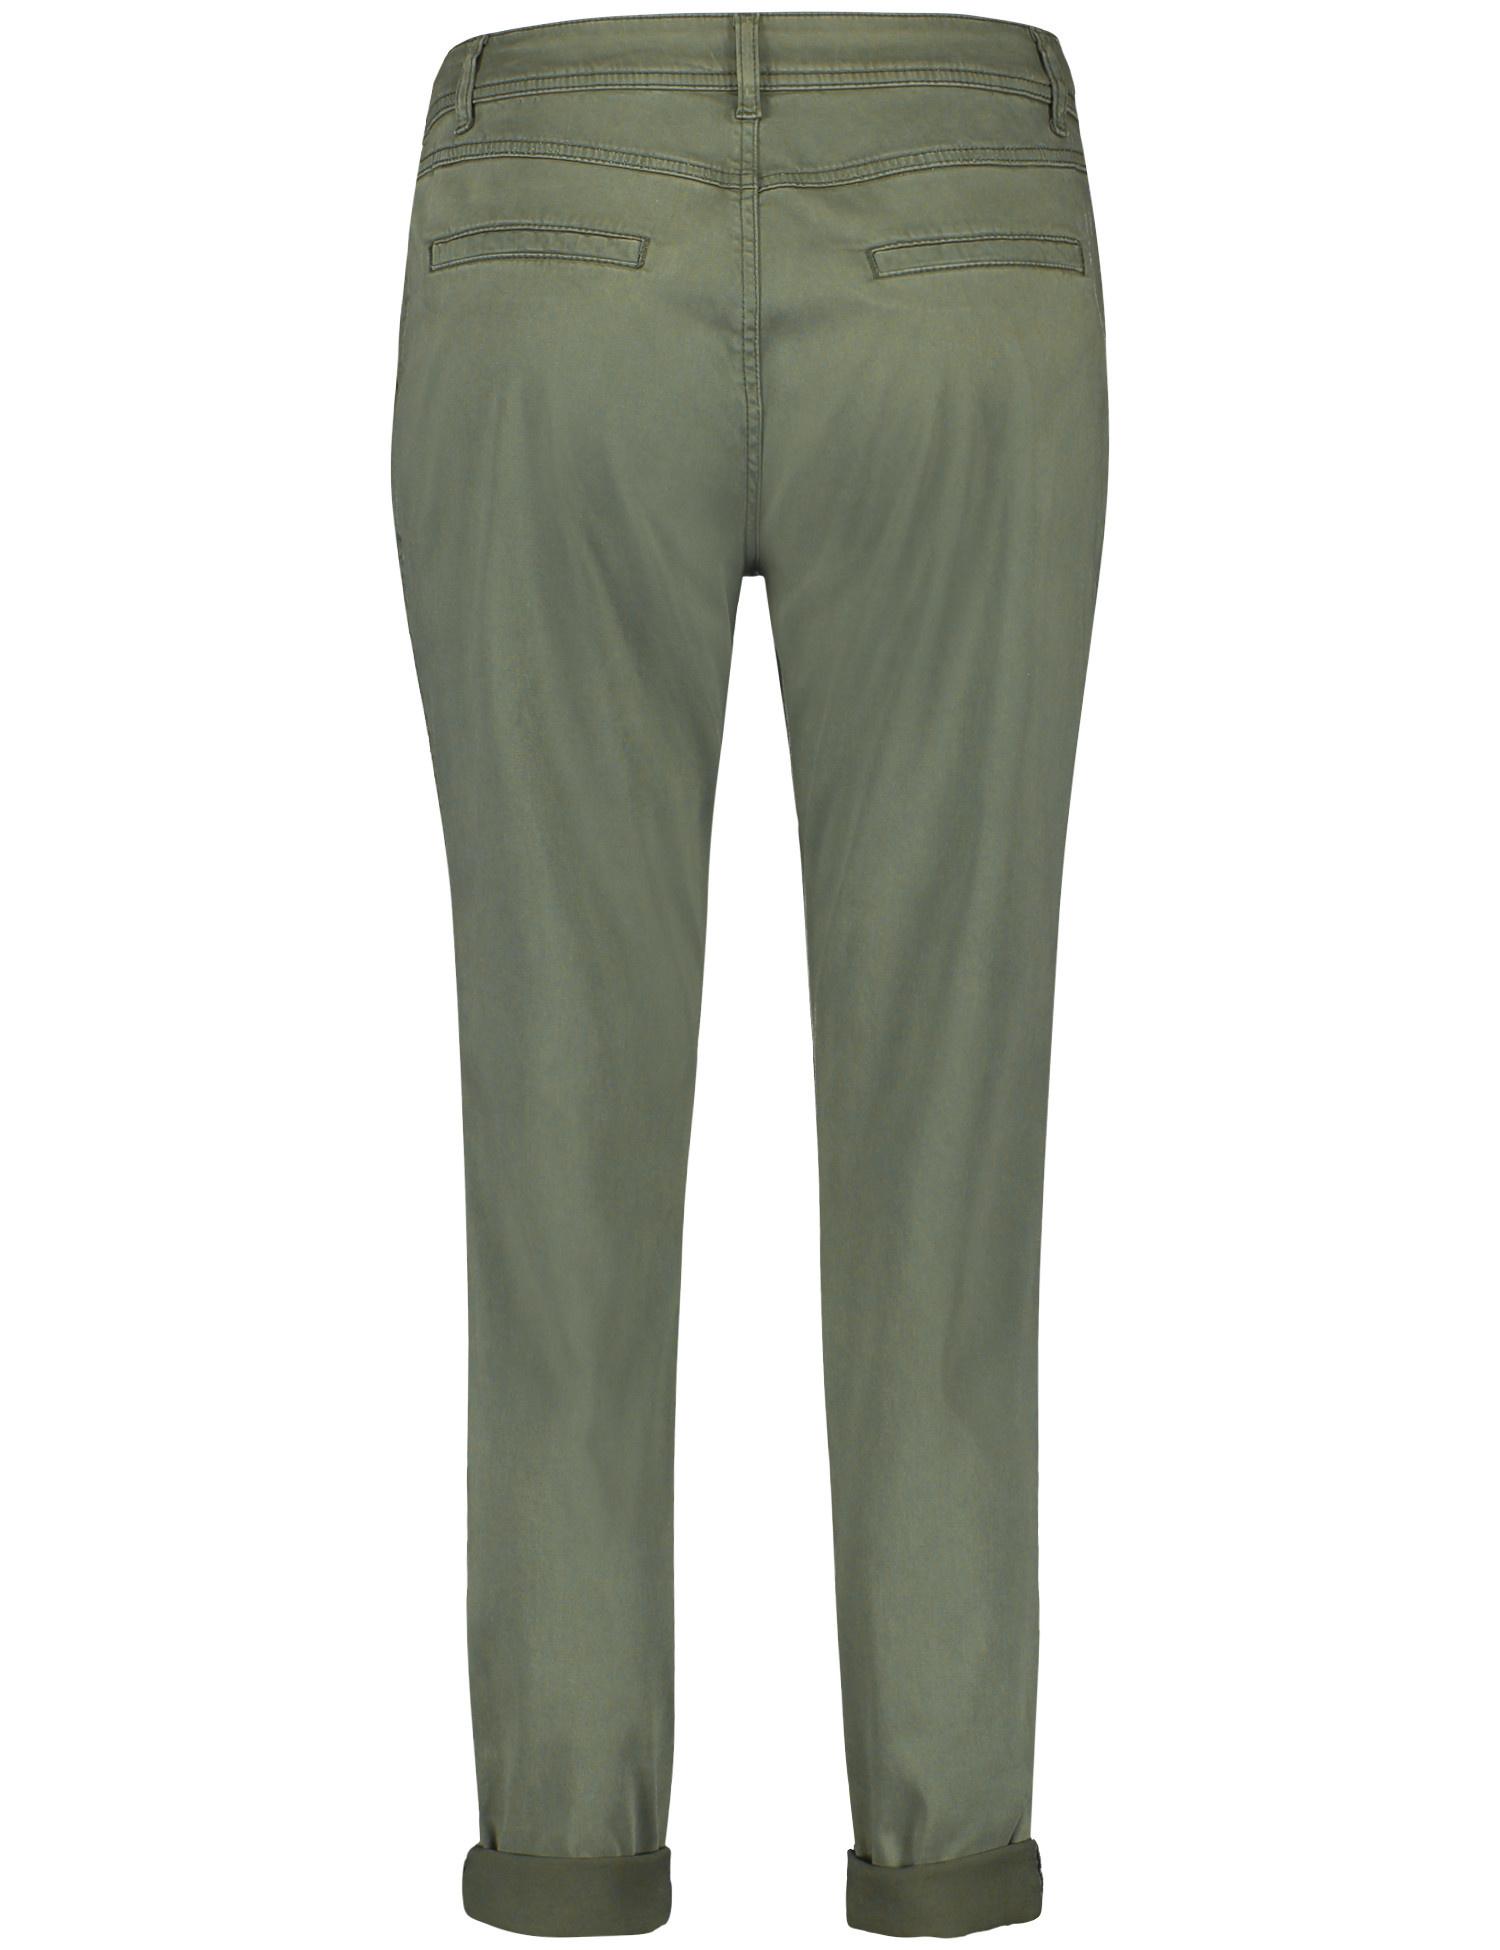 TAIFUN pantalon chino-3